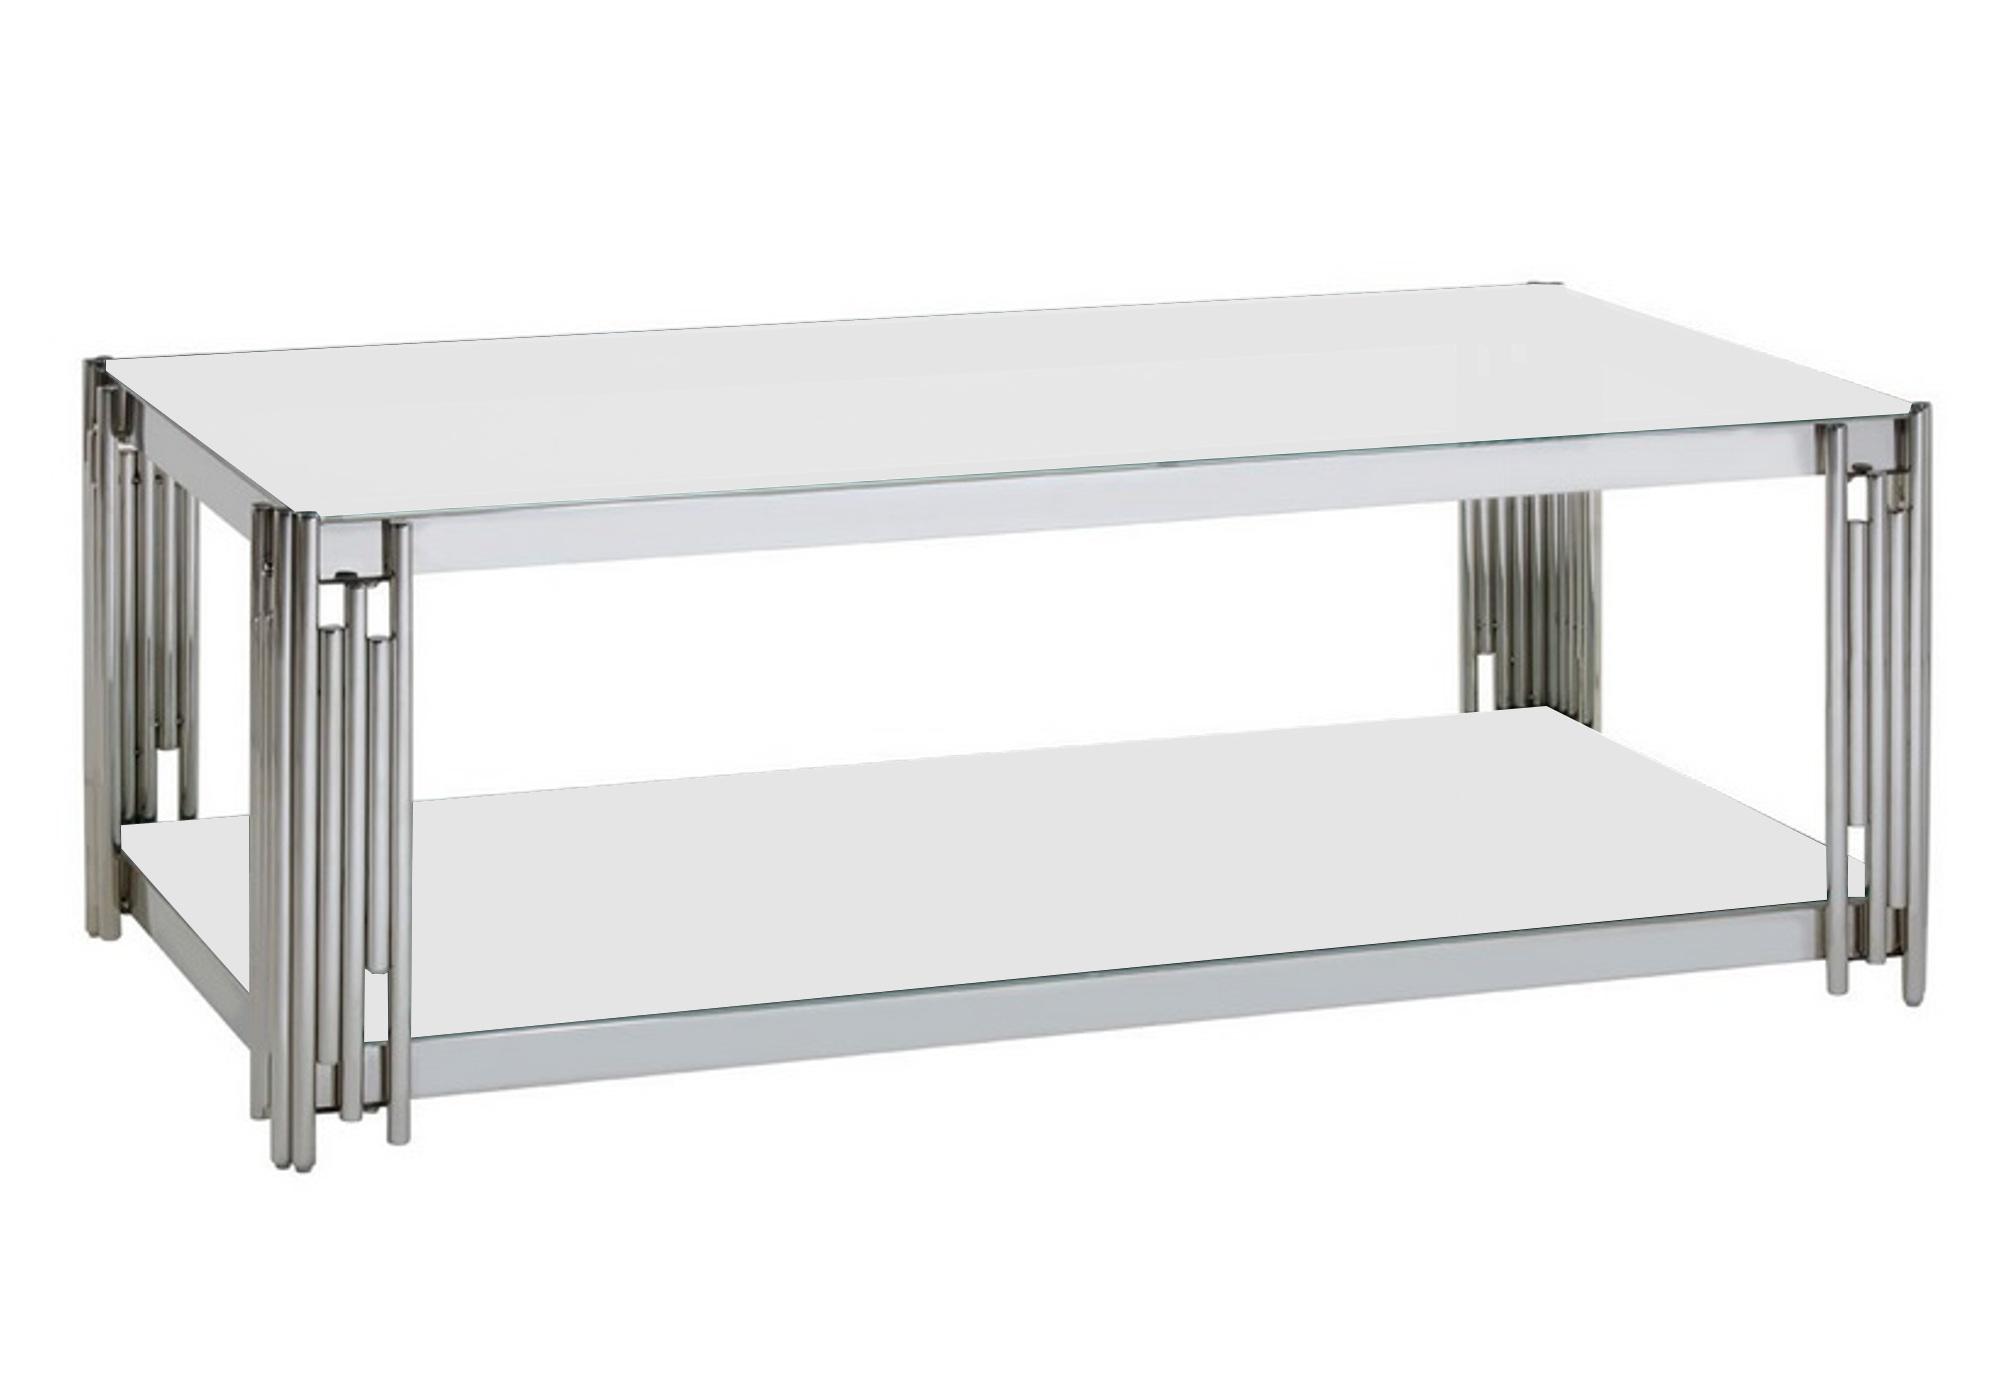 Table basse design chromé blanc ÈVE